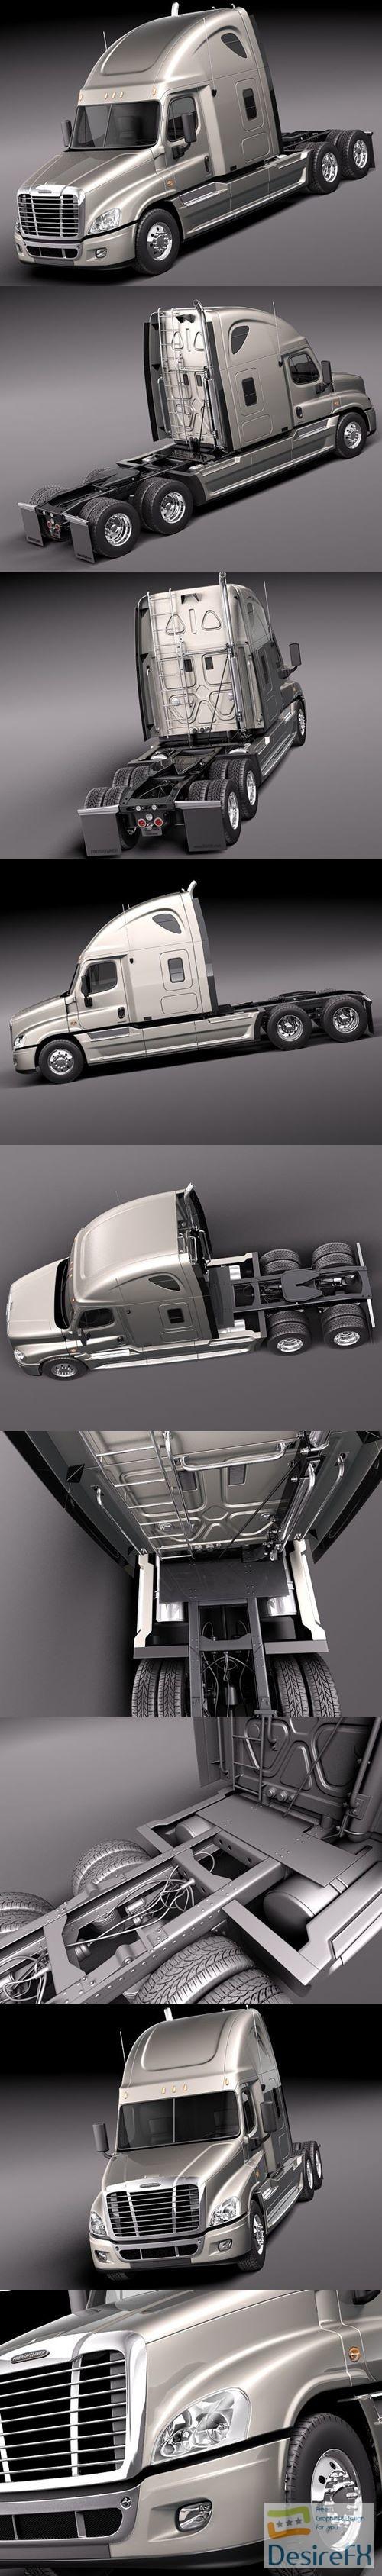 3d-models - Freightliner Cascadia 2011 3D Model